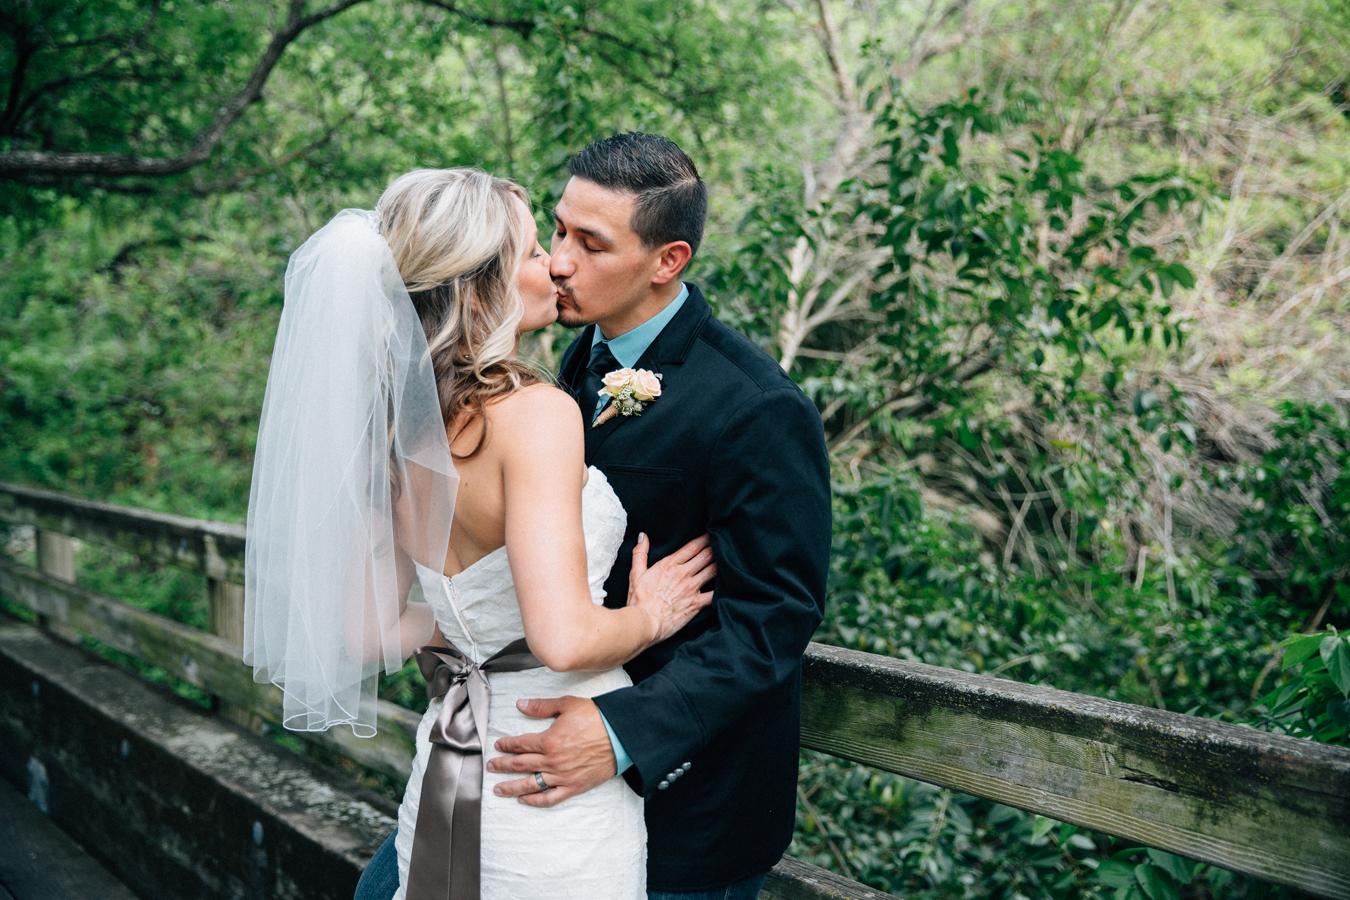 jt-wedding-cbarronjr-1297.jpg